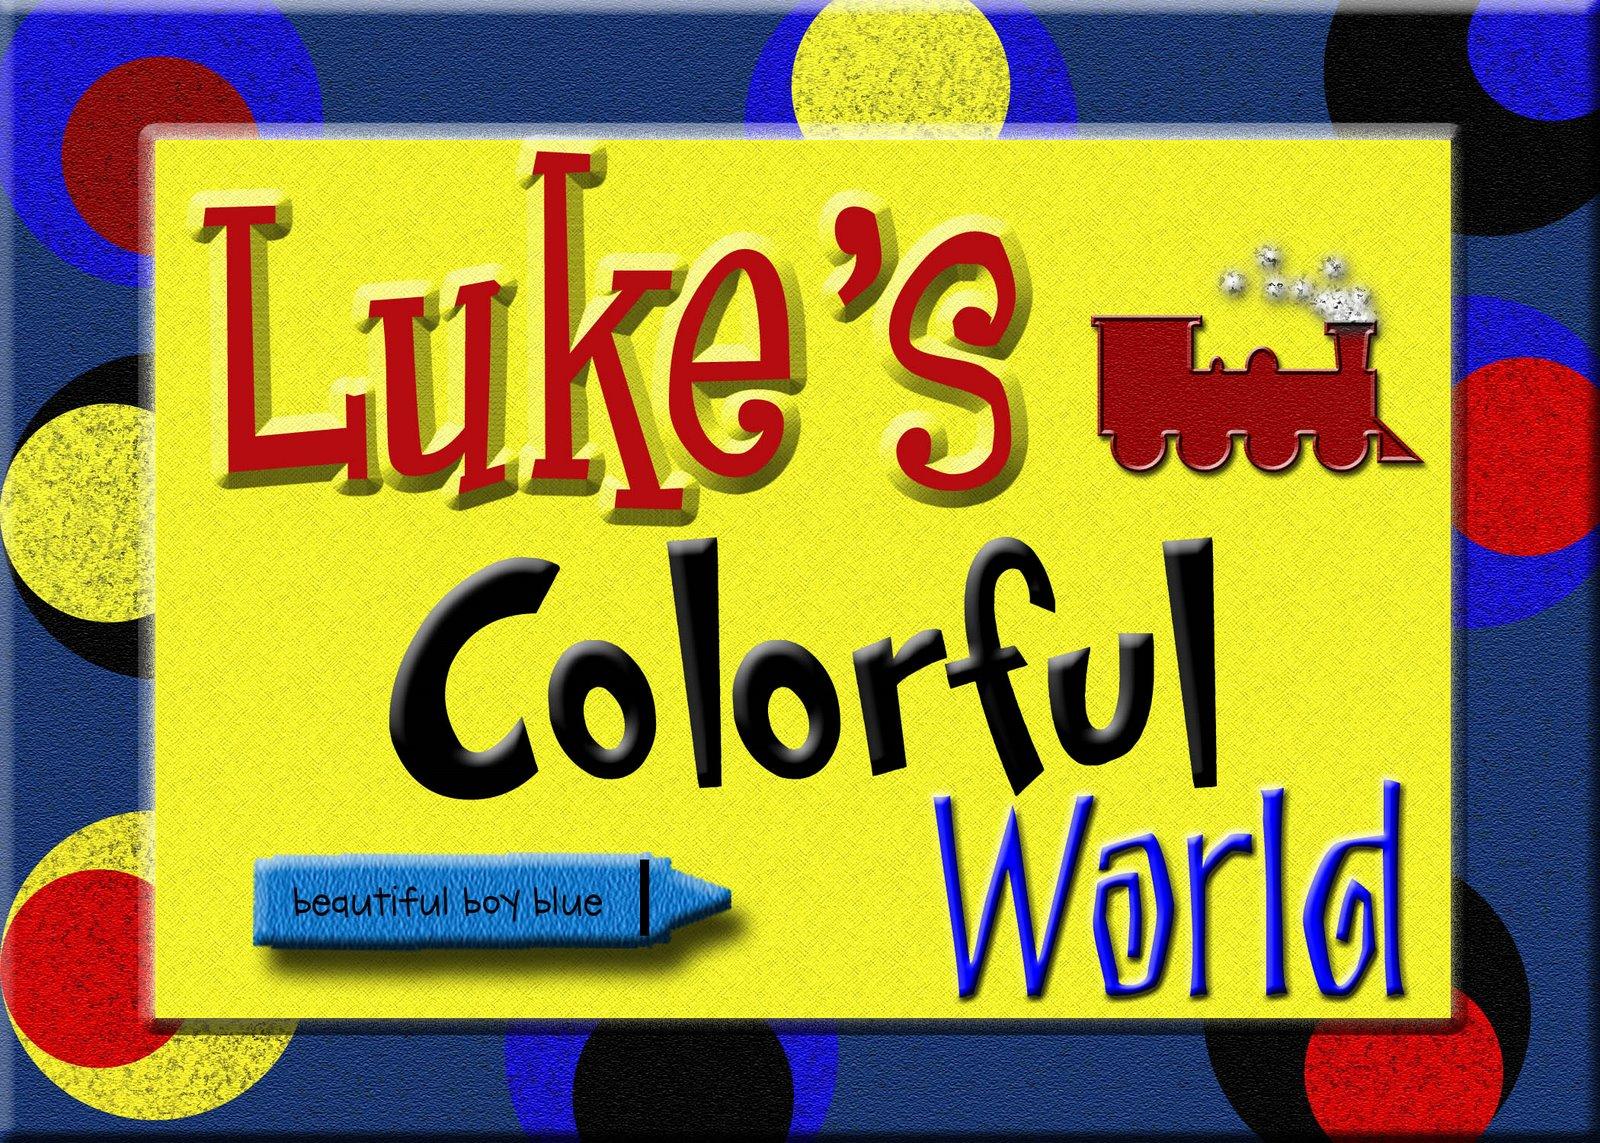 Luke's Colorful World